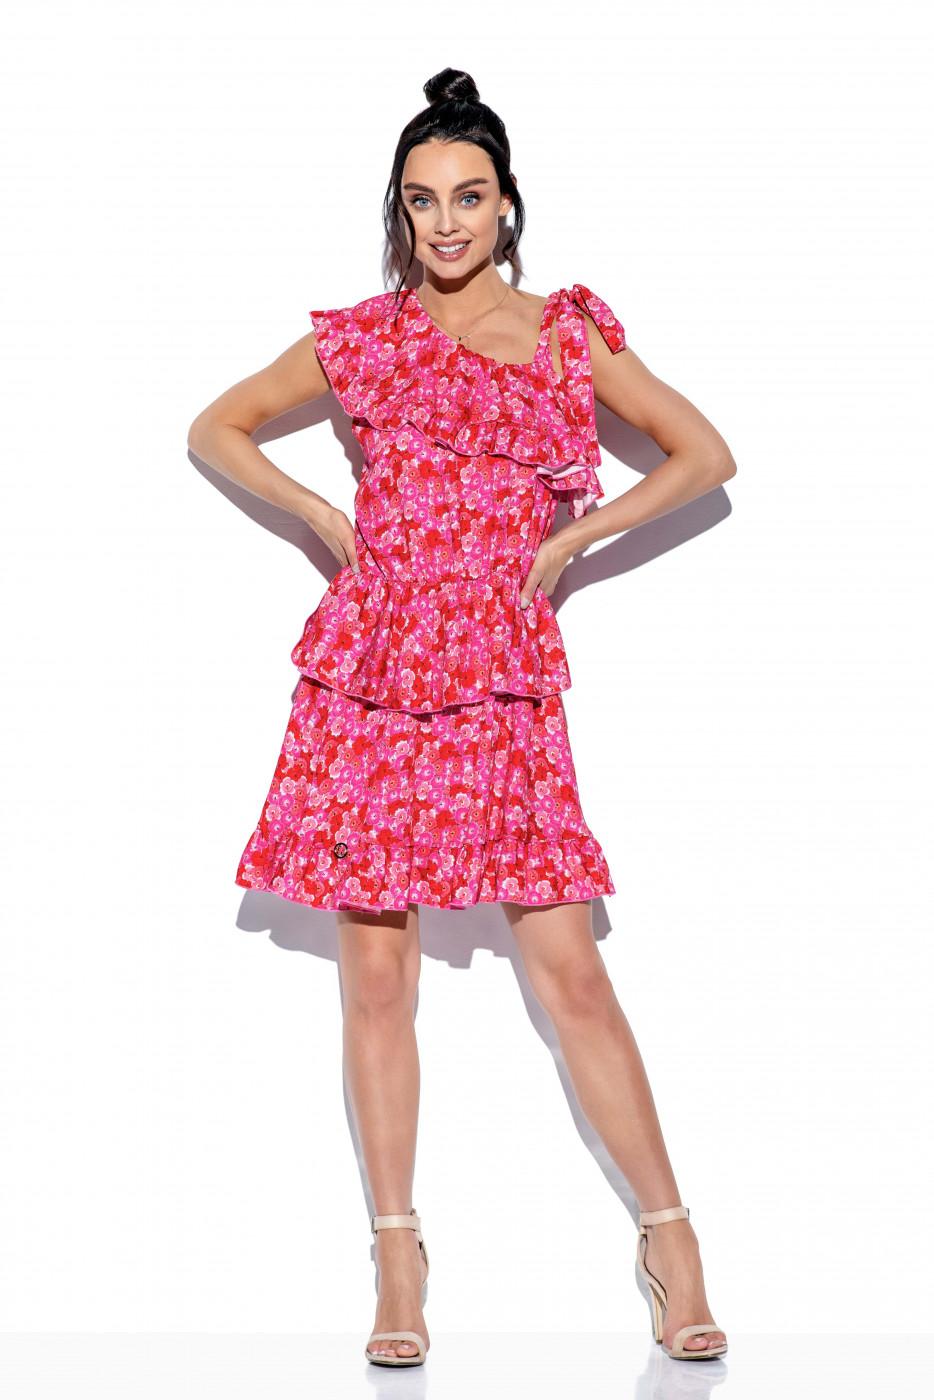 Lemoniade Woman's Dress LG546 Pattern 17